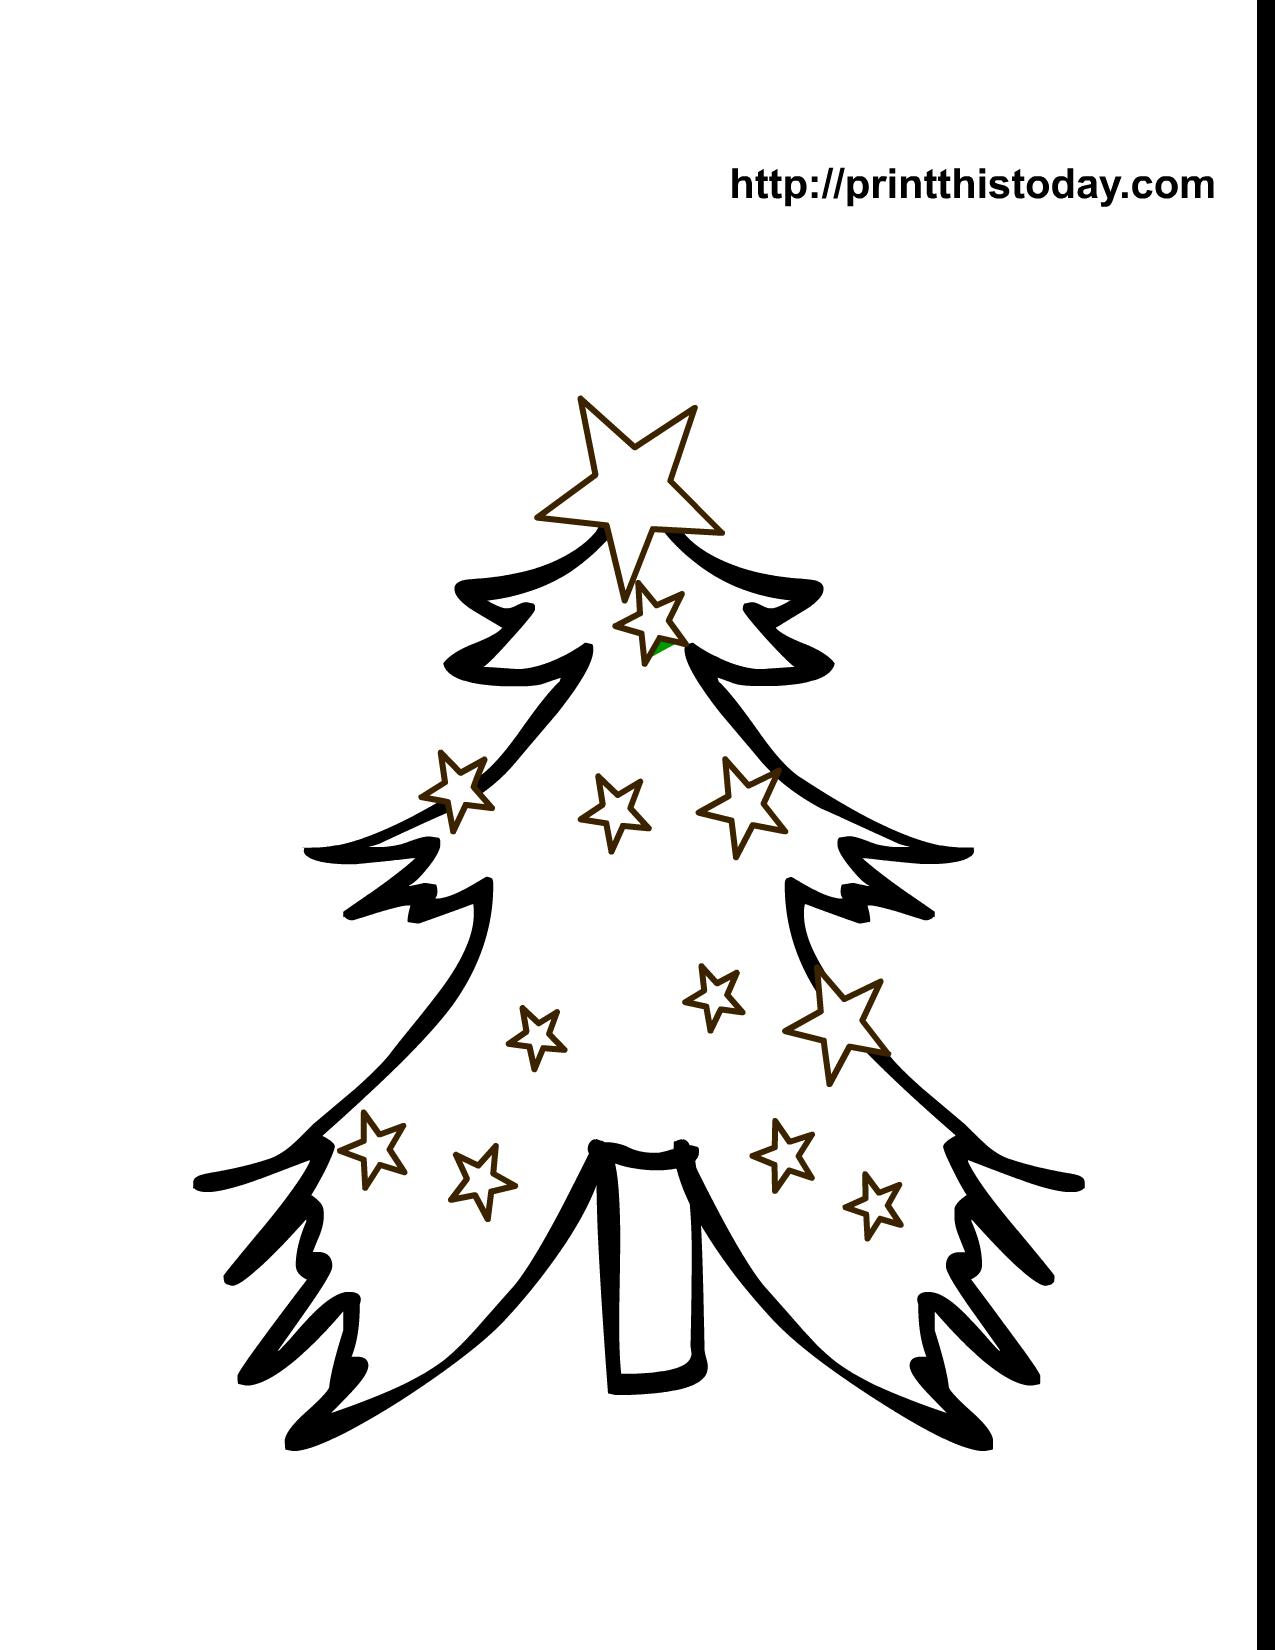 adorable free printable christmas tree - Coloring Pages Of Christmas Trees 3